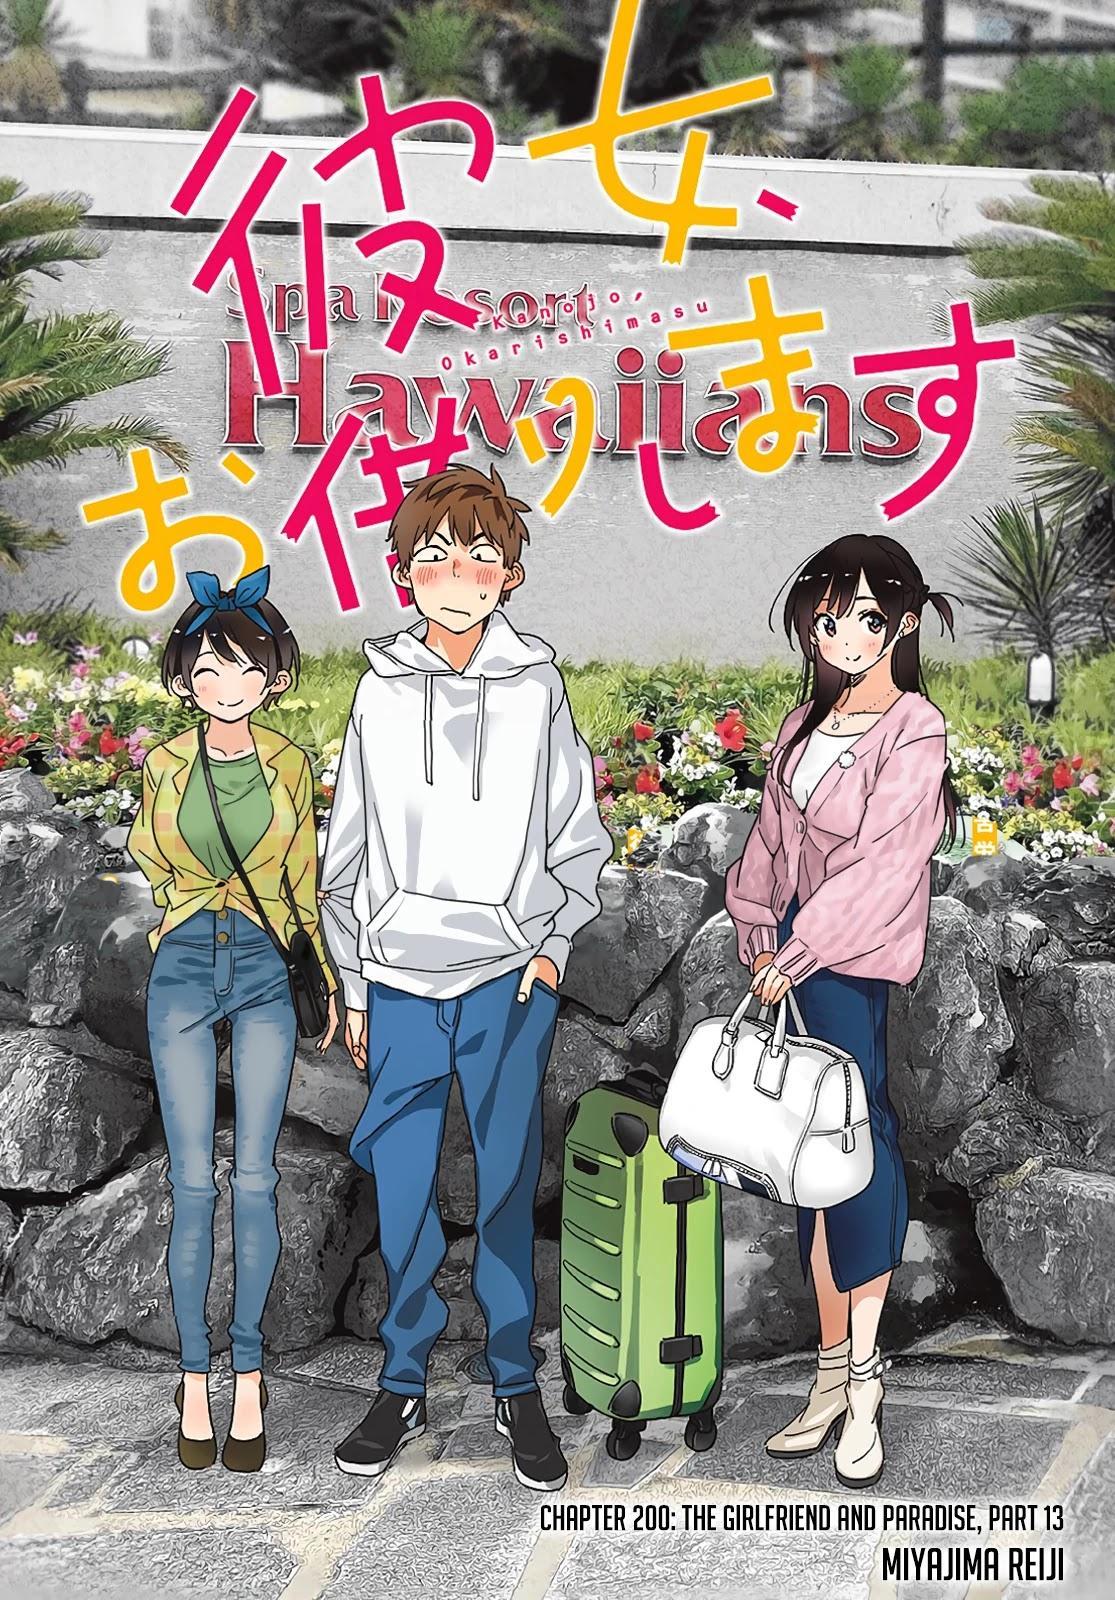 Kanojo, Okarishimasu Chapter 200: The Girlfriend And Paradise (Part 13) page 2 - Mangakakalots.com